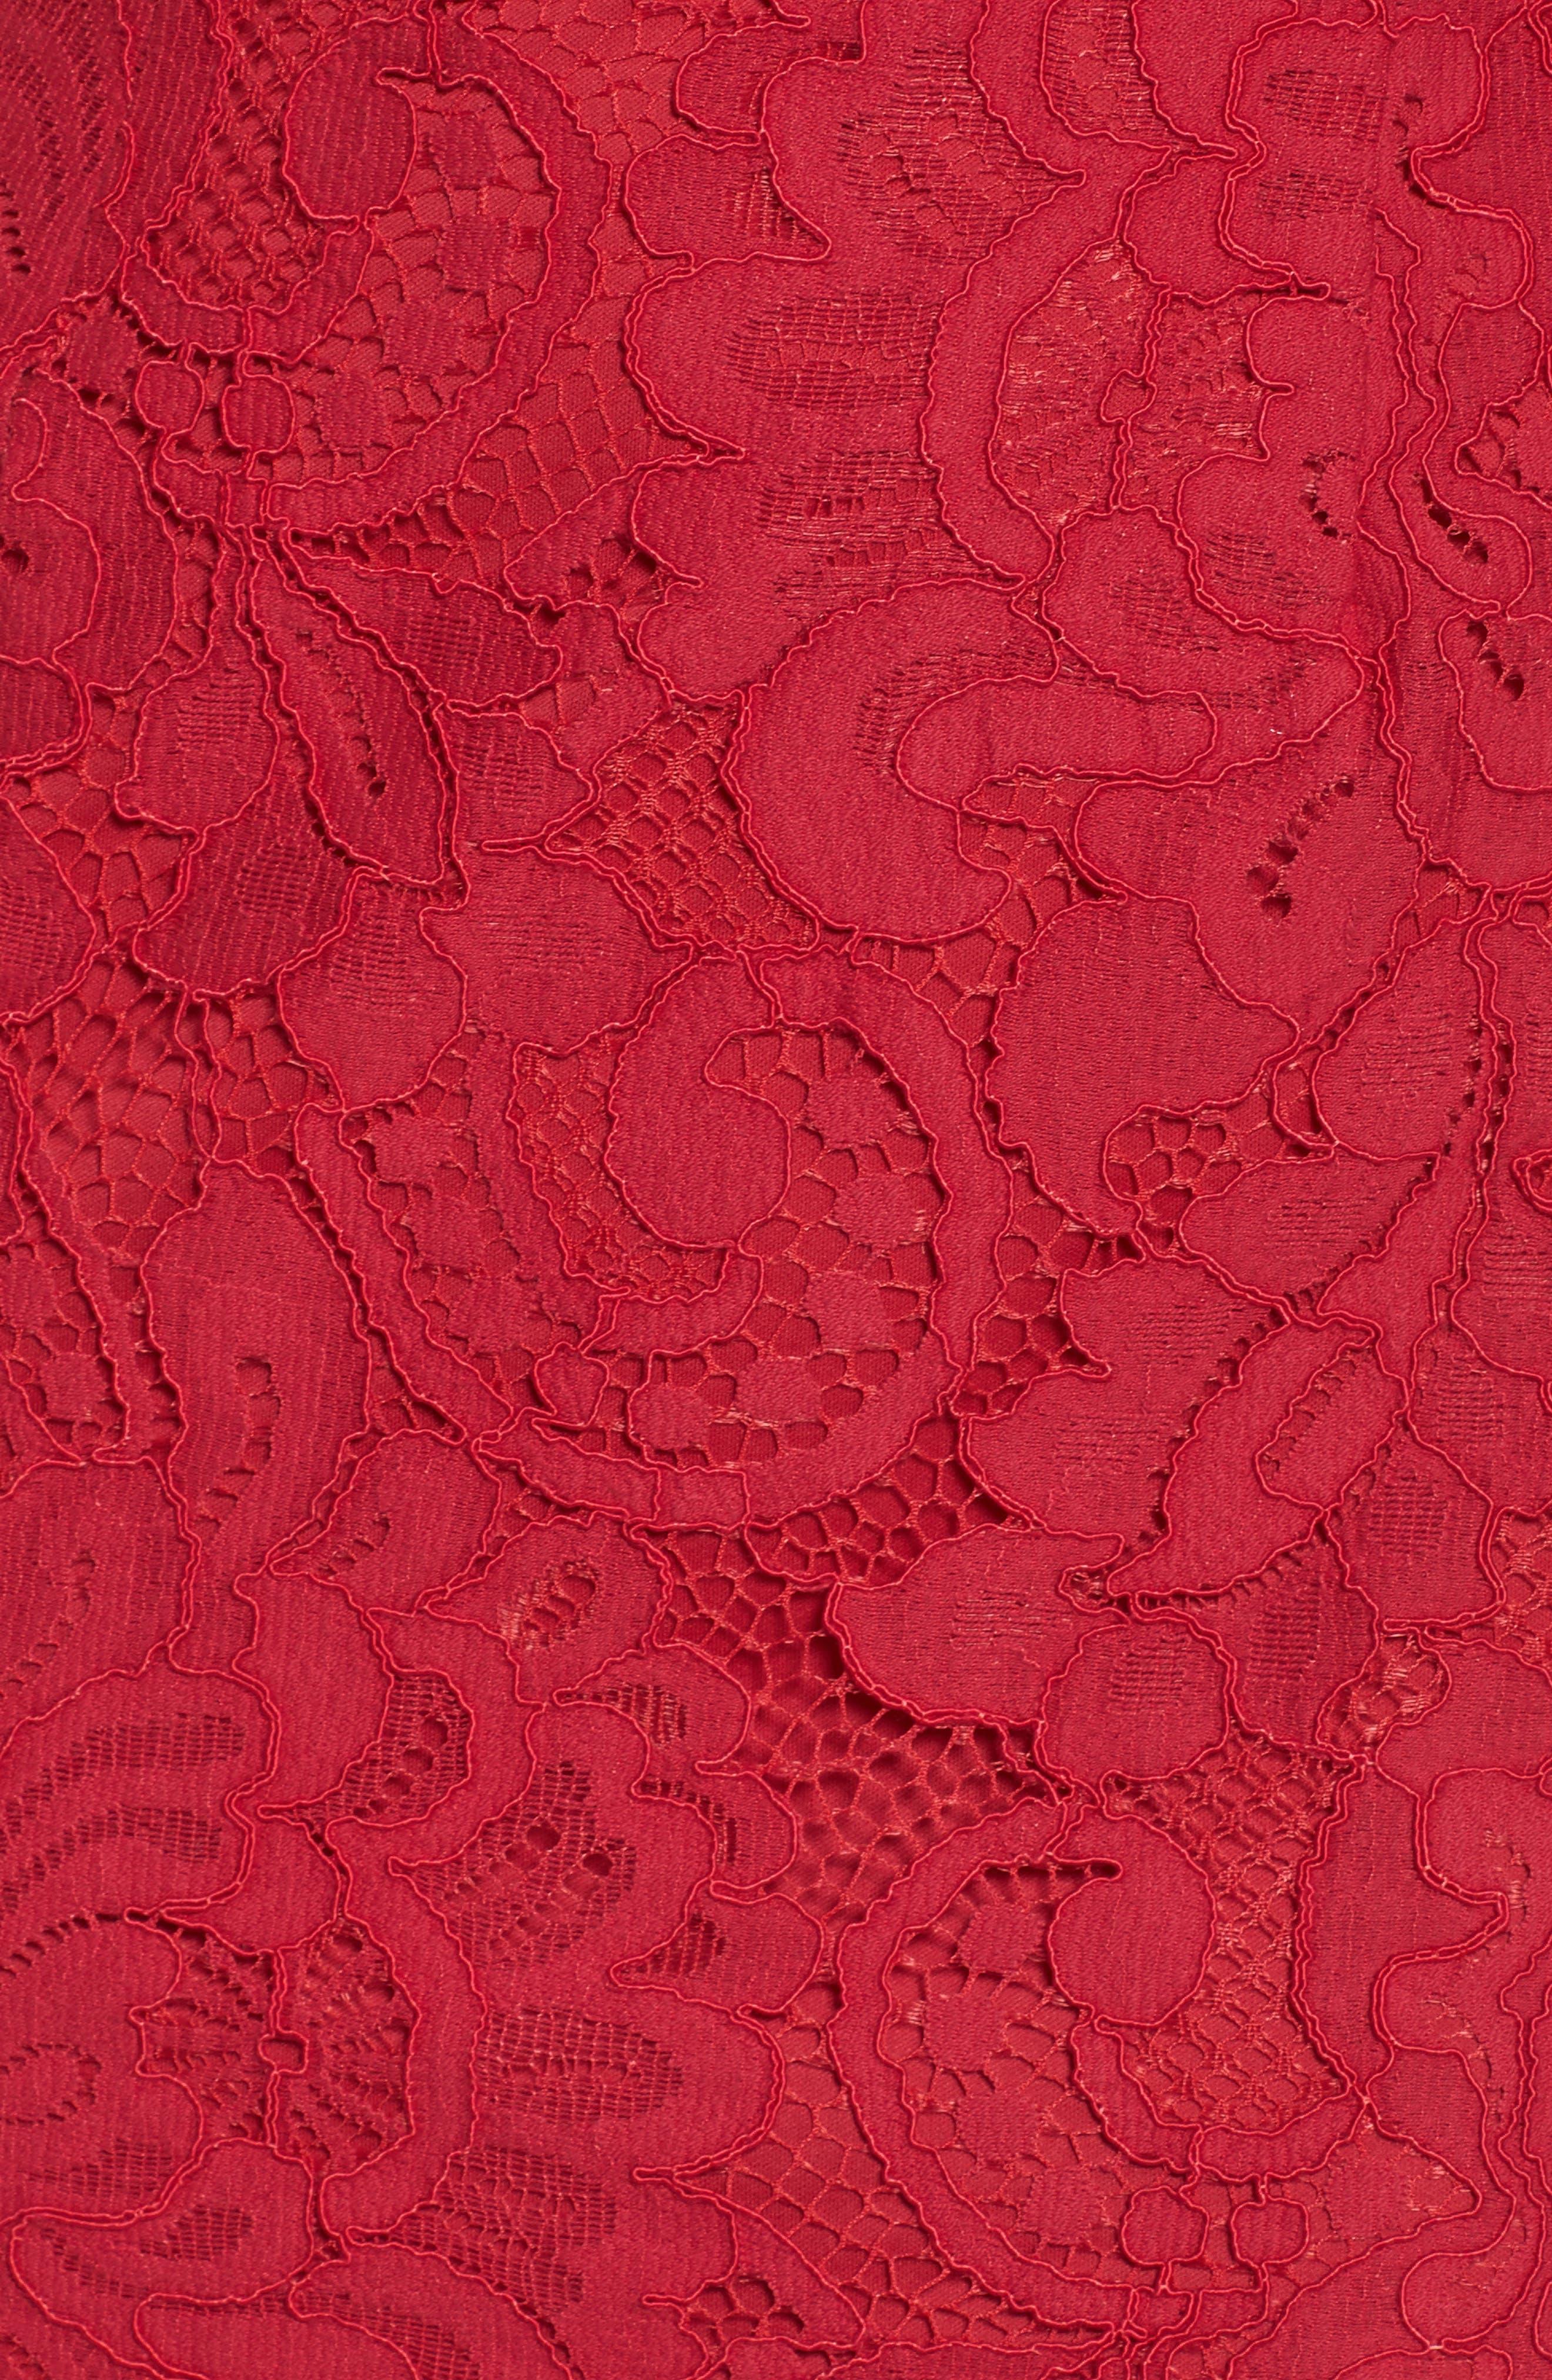 Off the Shoulder Lace Sheath Dress,                             Alternate thumbnail 6, color,                             620